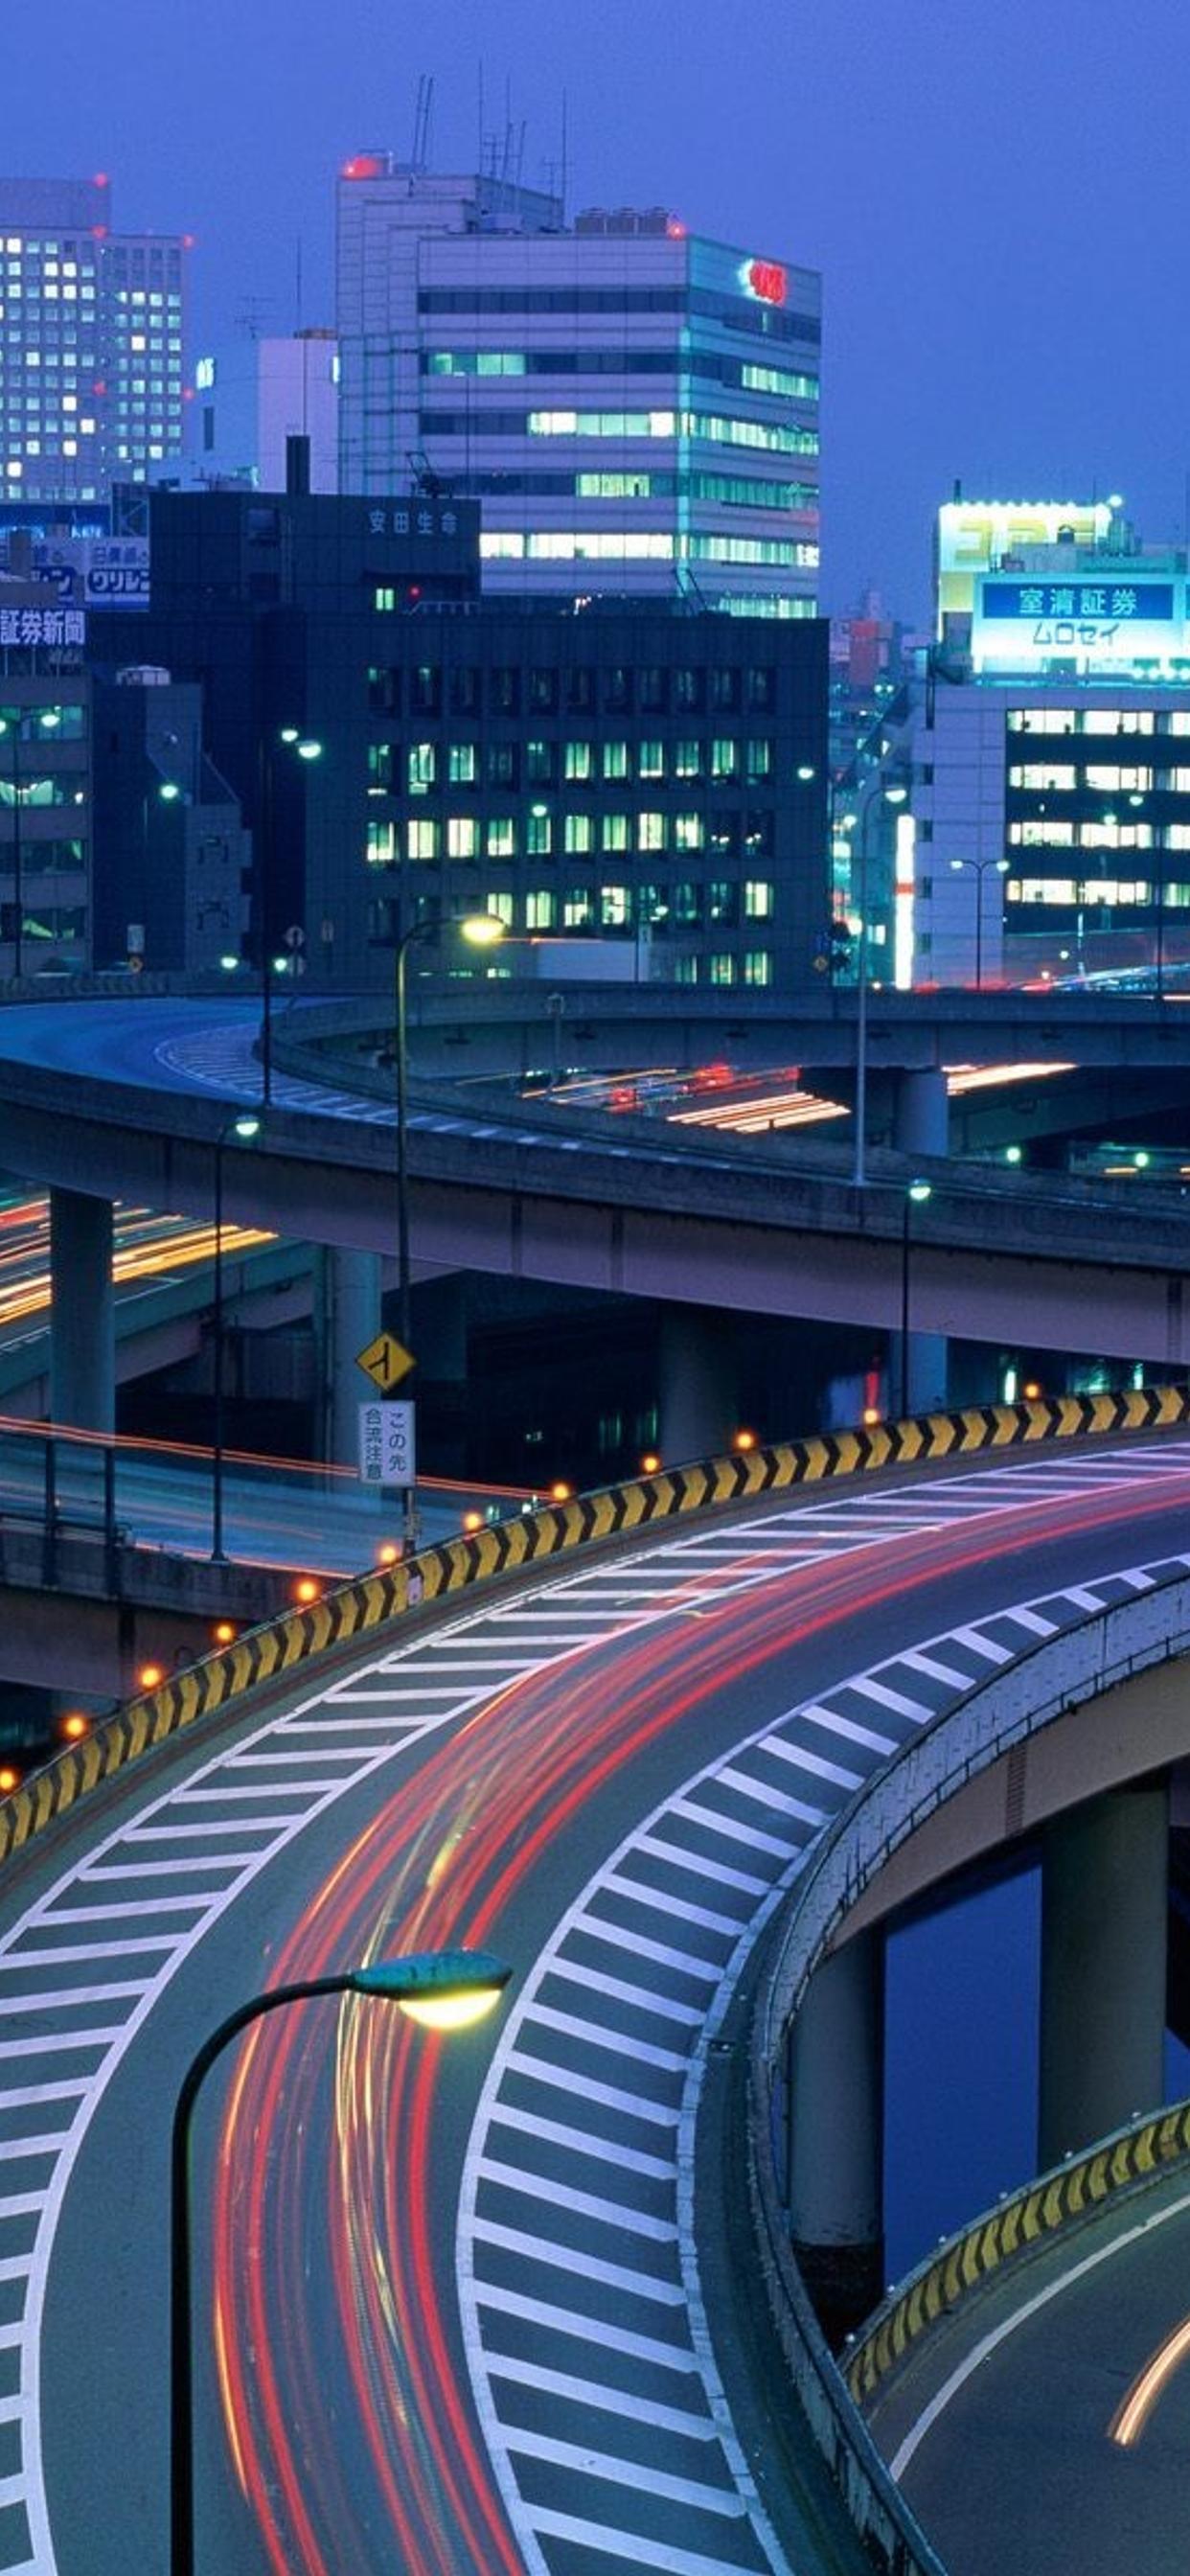 Tokyo City Wallpaper Most Popular City Of Japan